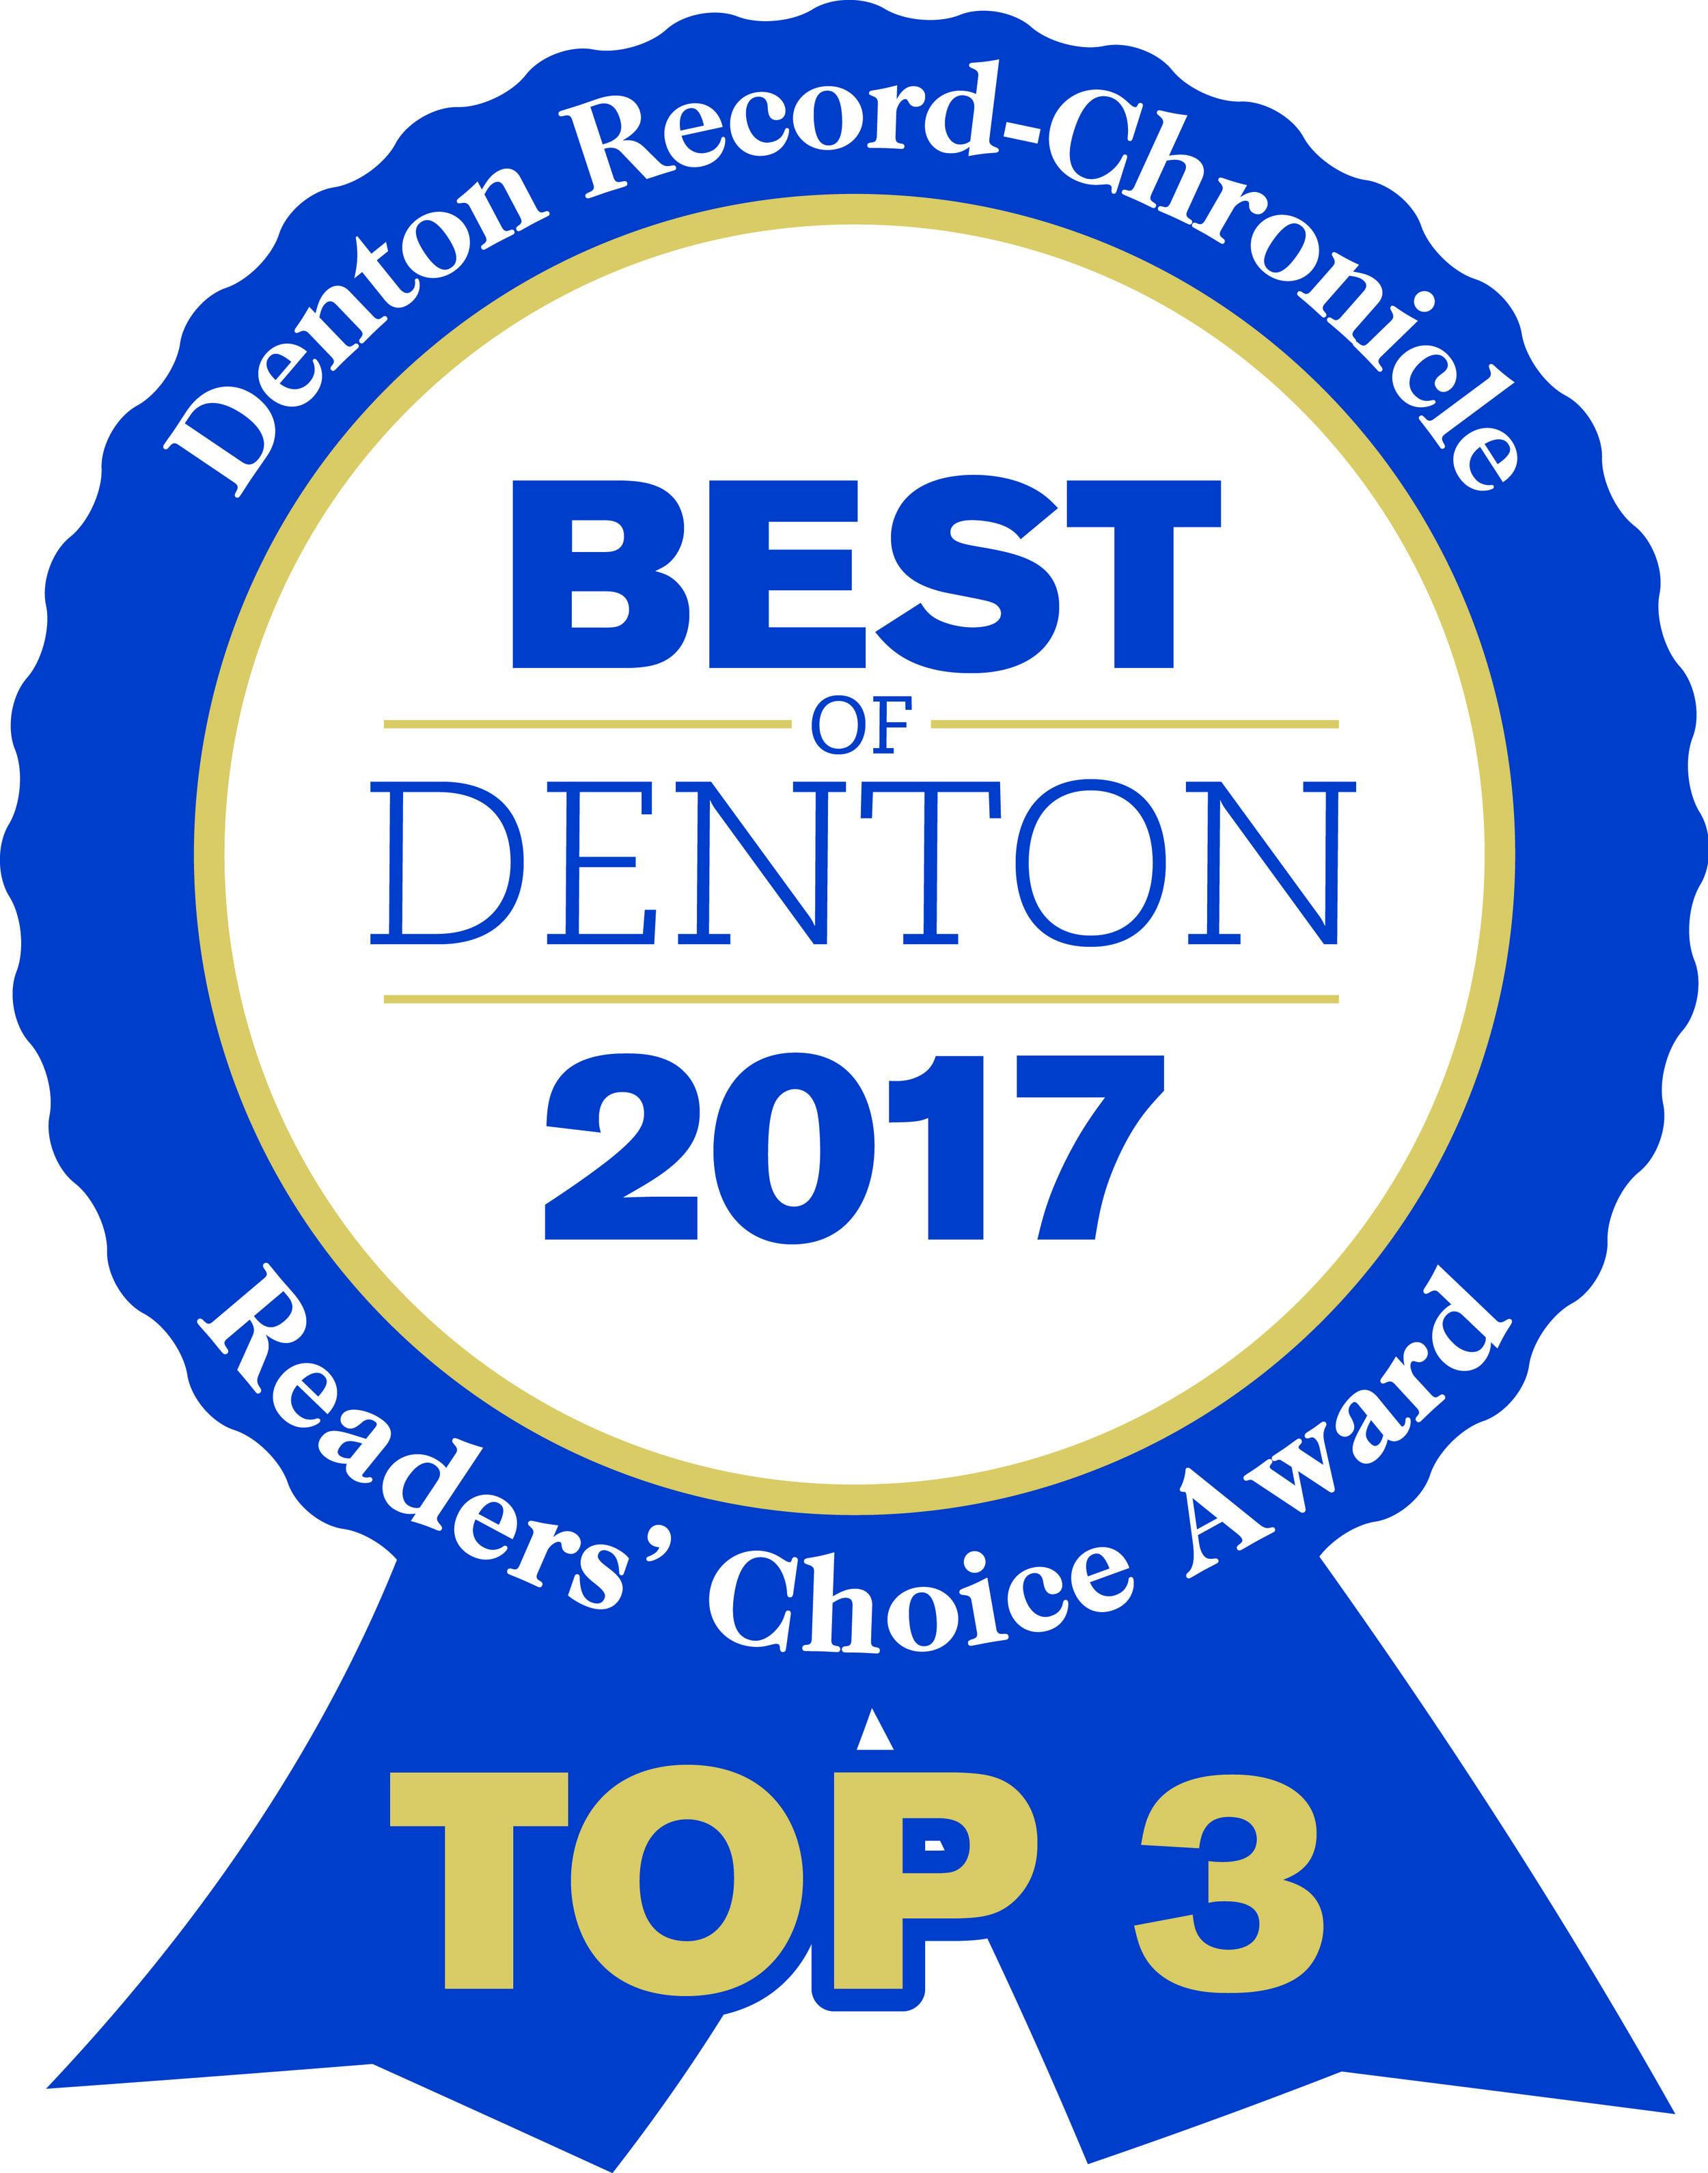 Best of Denton Top 3 Ribbon.jpg